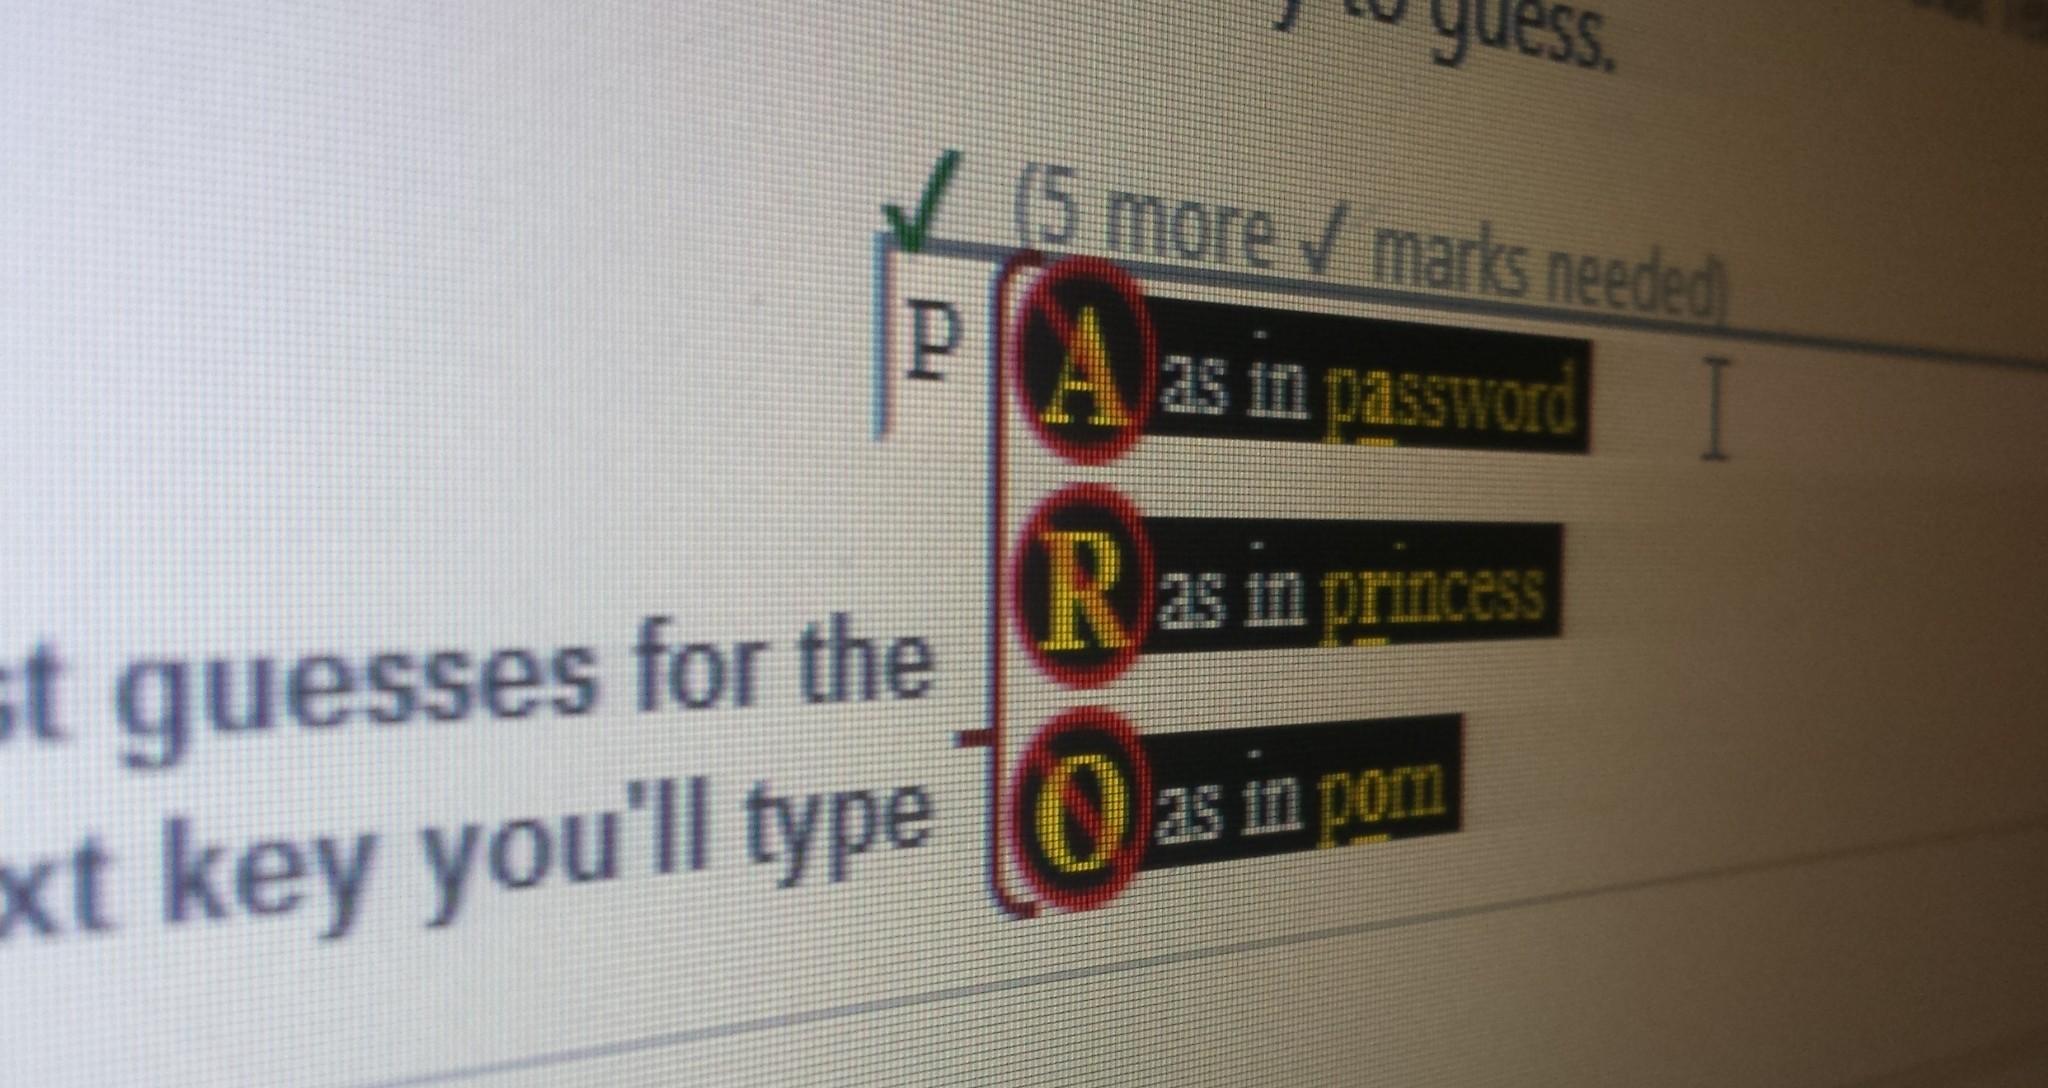 Telepathwords: How Bad are Your Passwords?